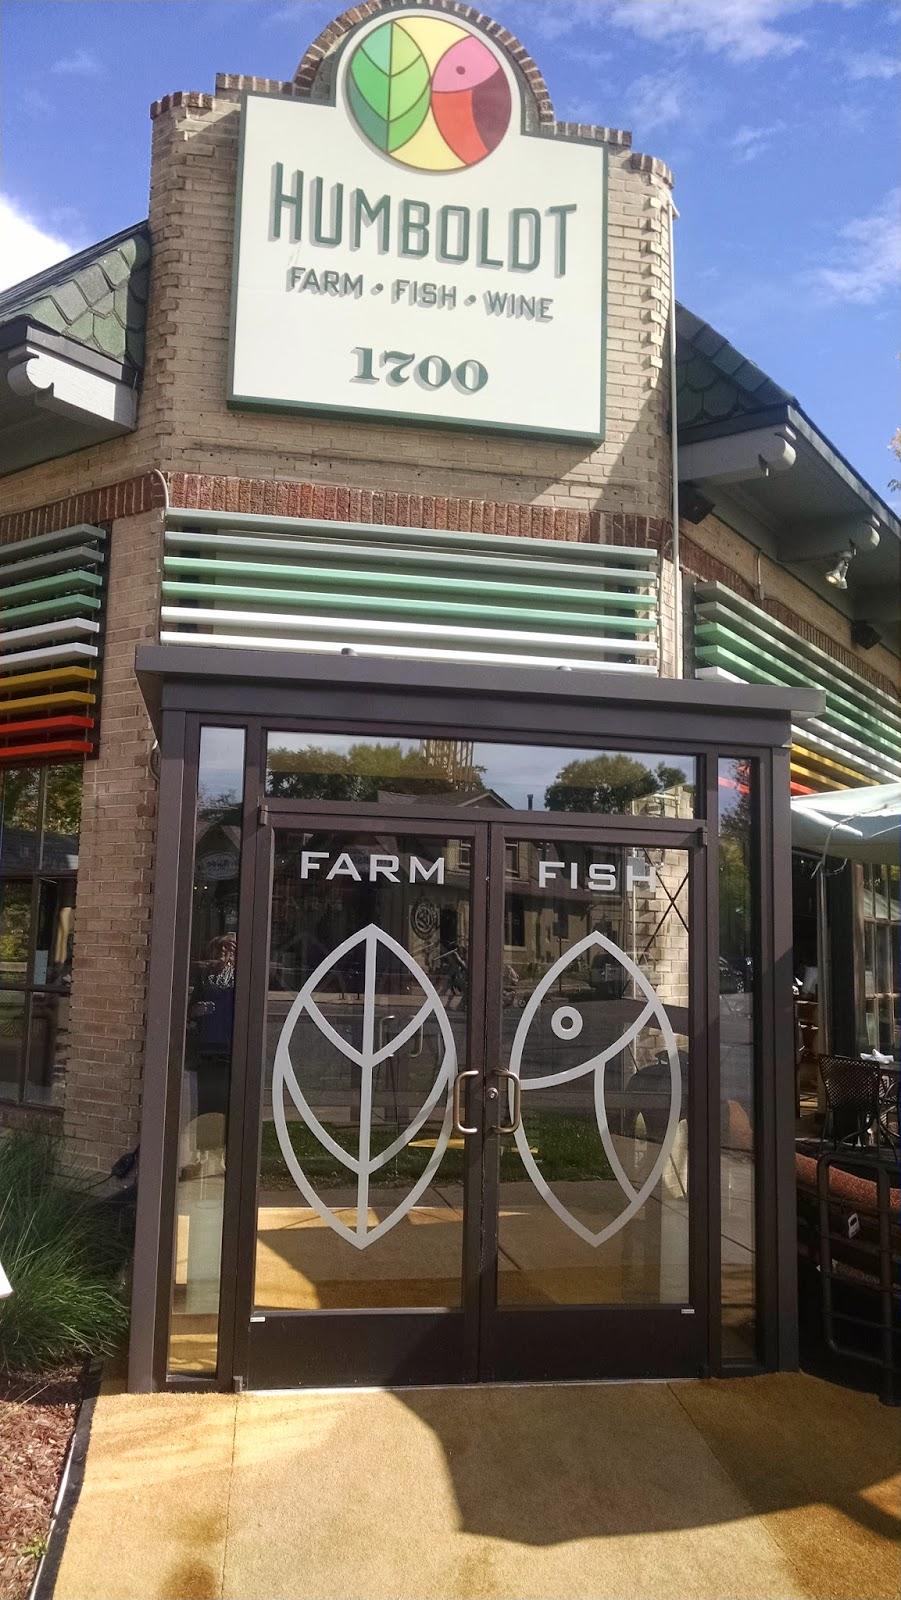 Atlanta etc marilyn wolf 39 s food blog and restaurant blog for Humboldt farm fish wine